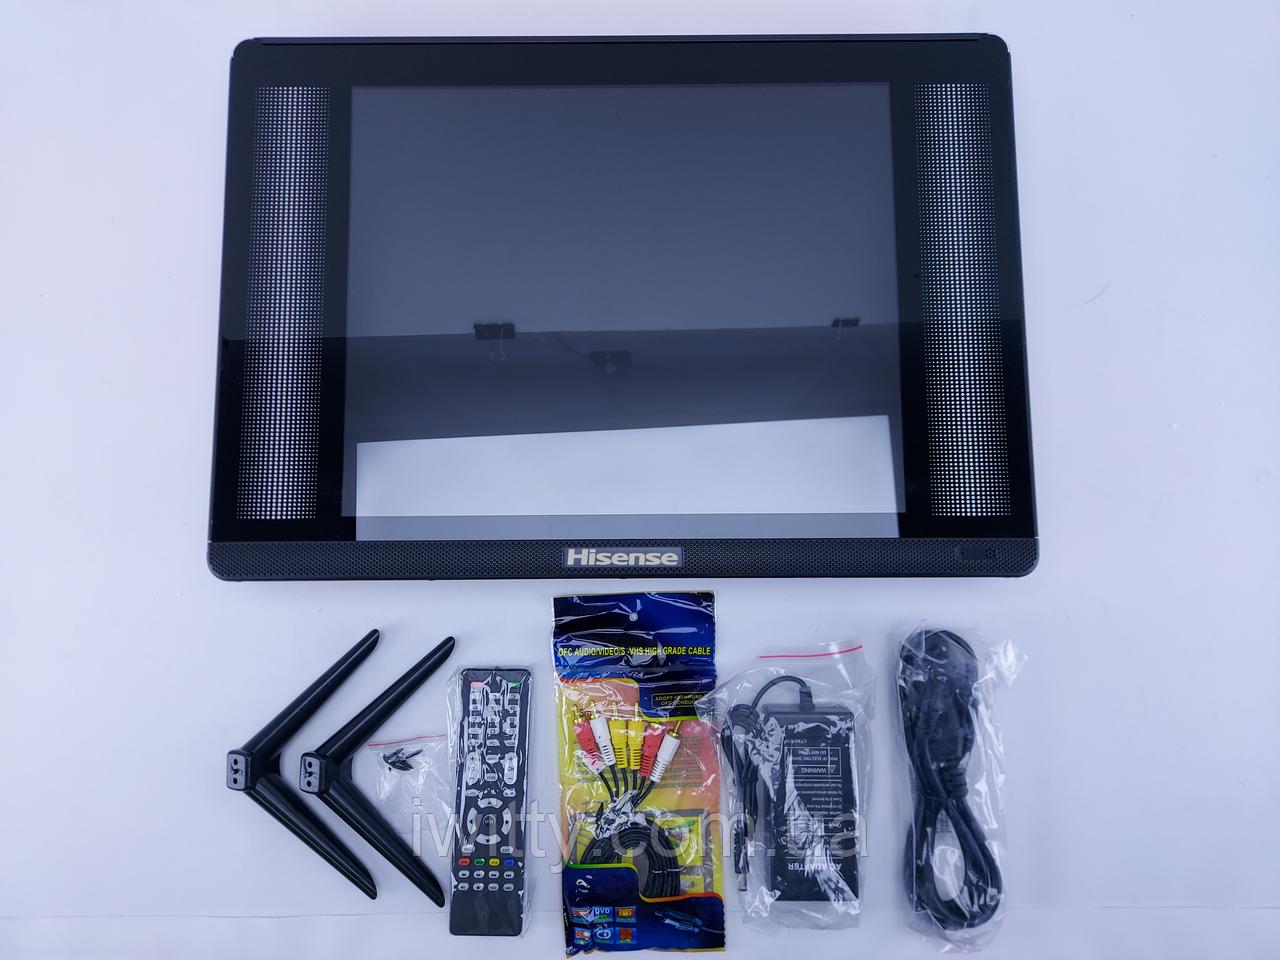 "Телевизор Hisense 15"" HD-Ready/DVB-T2/USB (1366x768)"